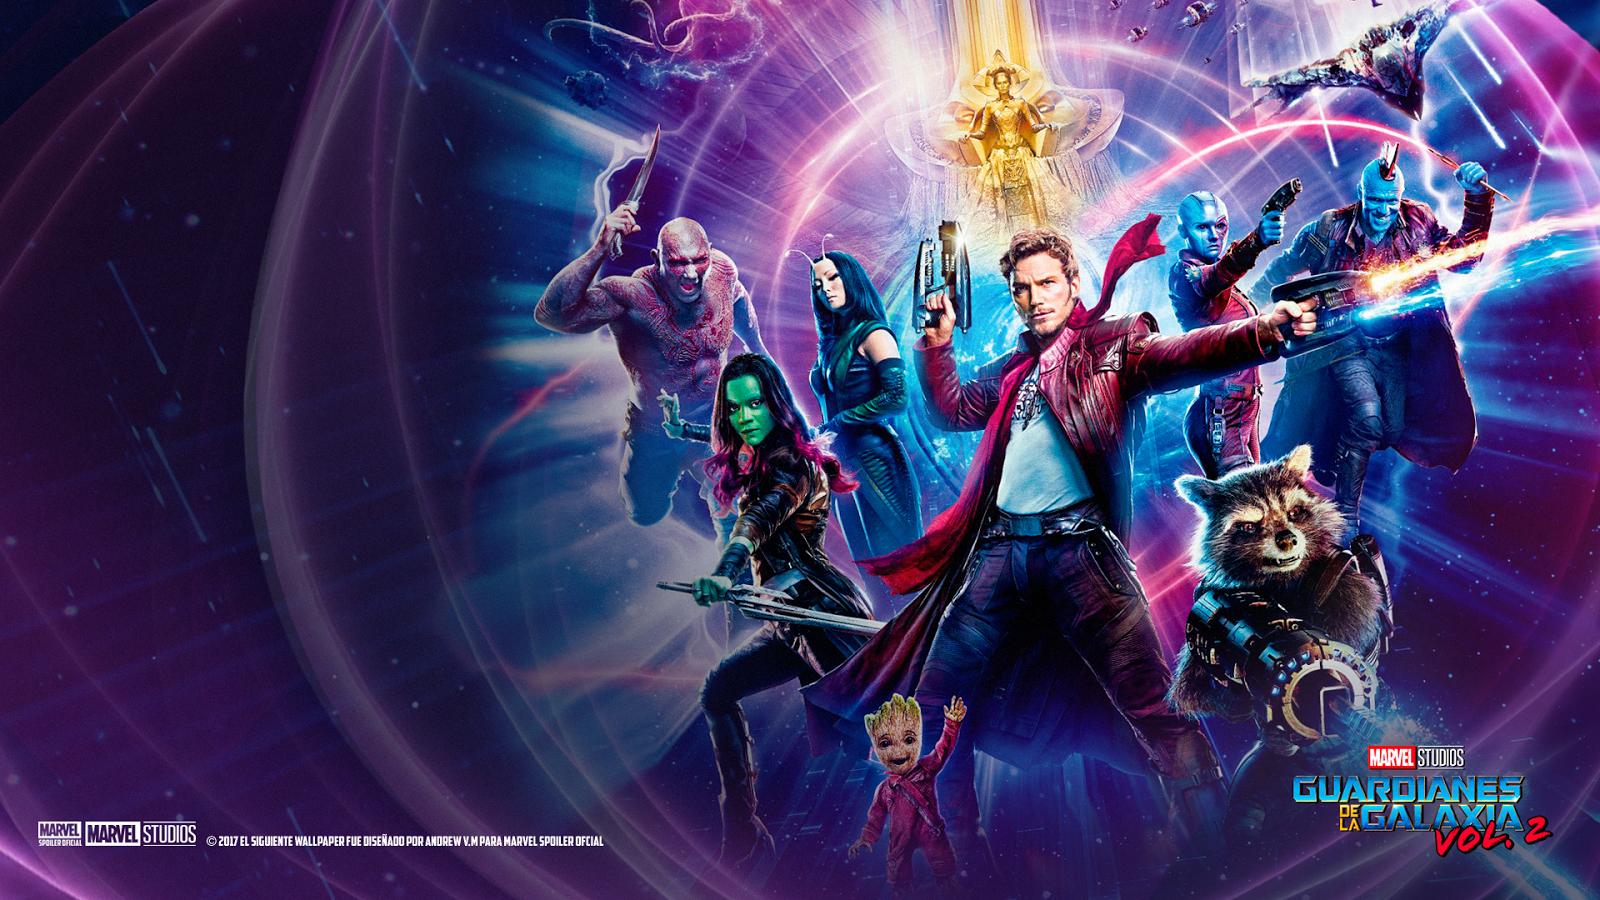 Guardians Of The Galaxy Vol 2 Wallpapers Wallpapersafari